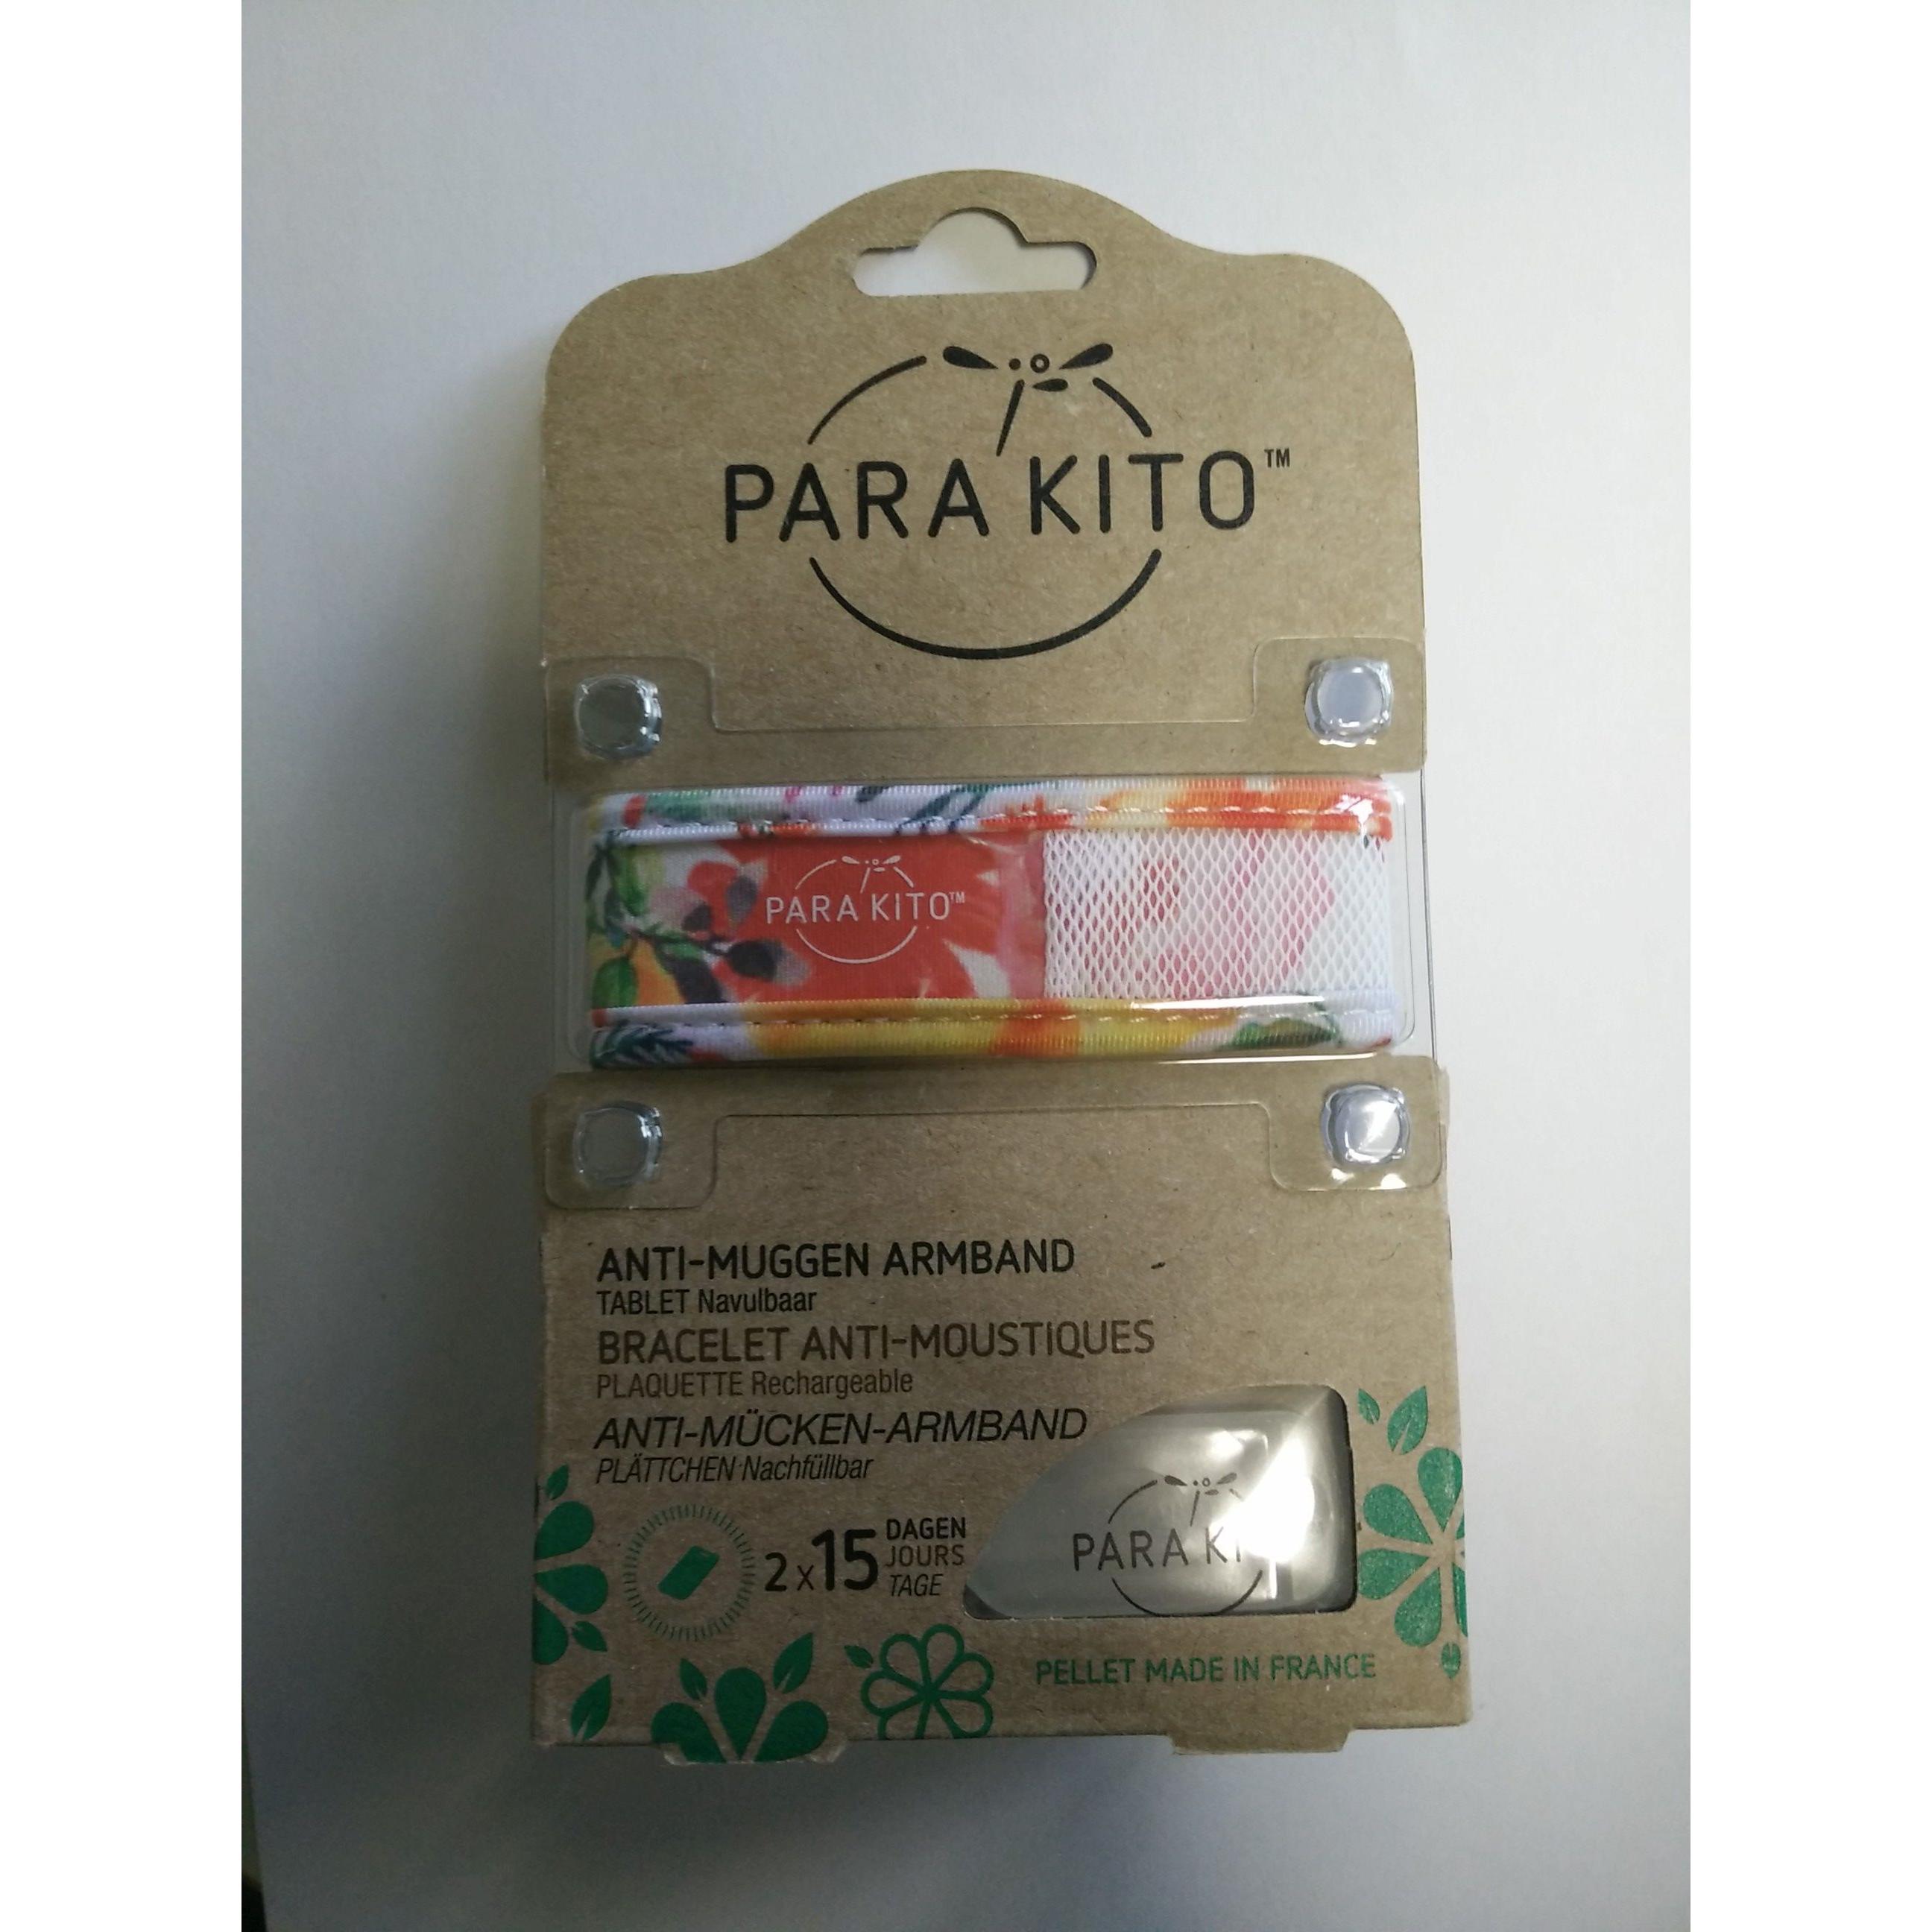 Parakito Anti-Muggen Armband Graffic Groot Model wit-bloemen